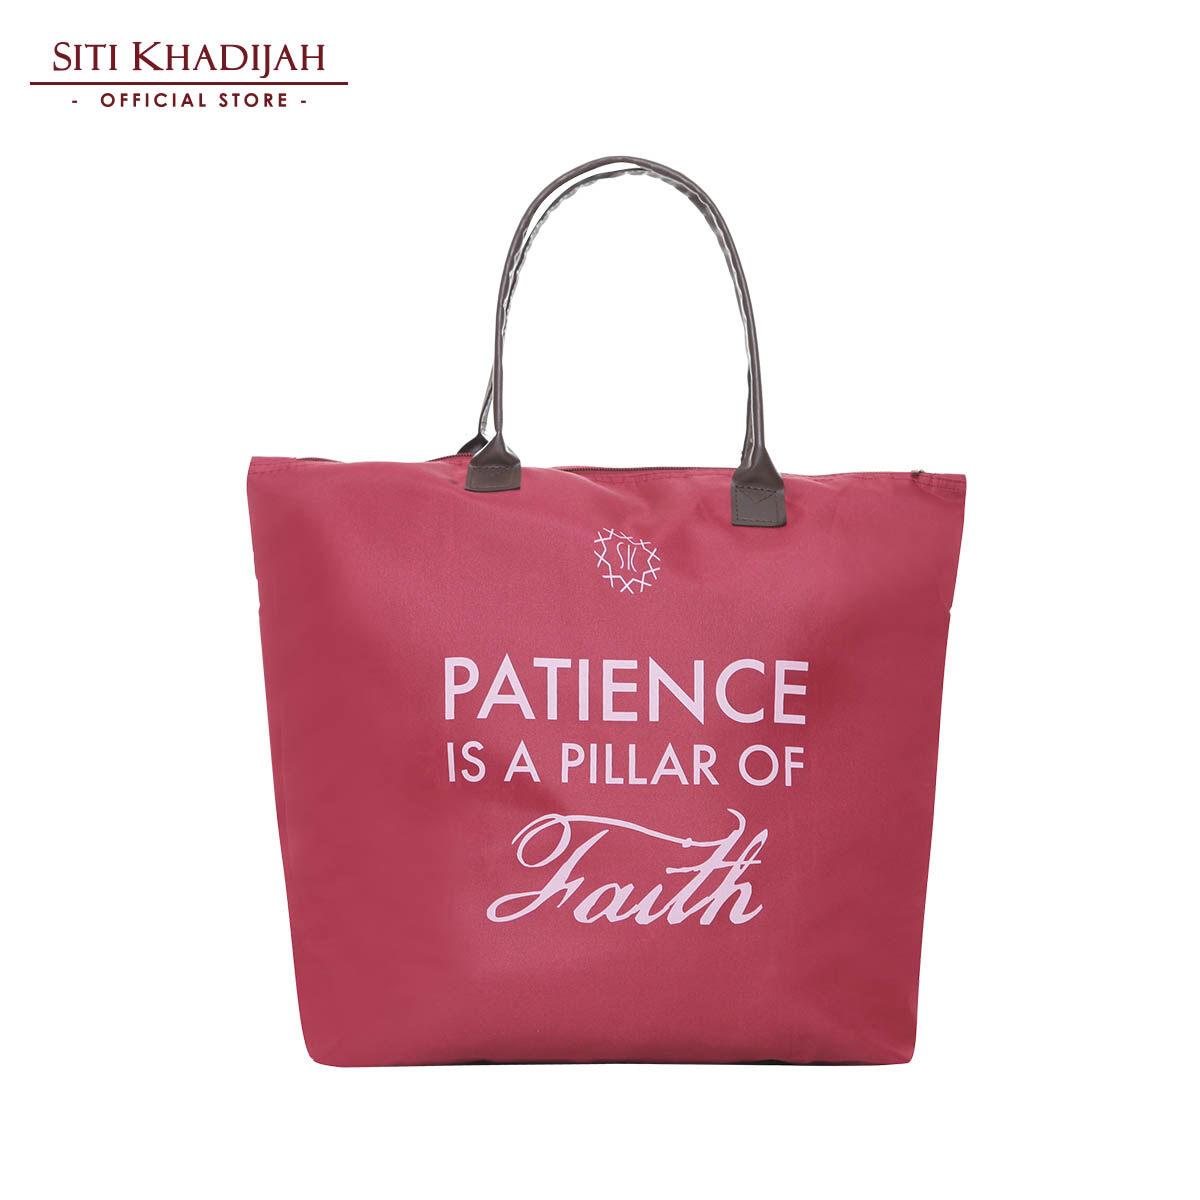 Siti Khadijah Tote Bag Patience